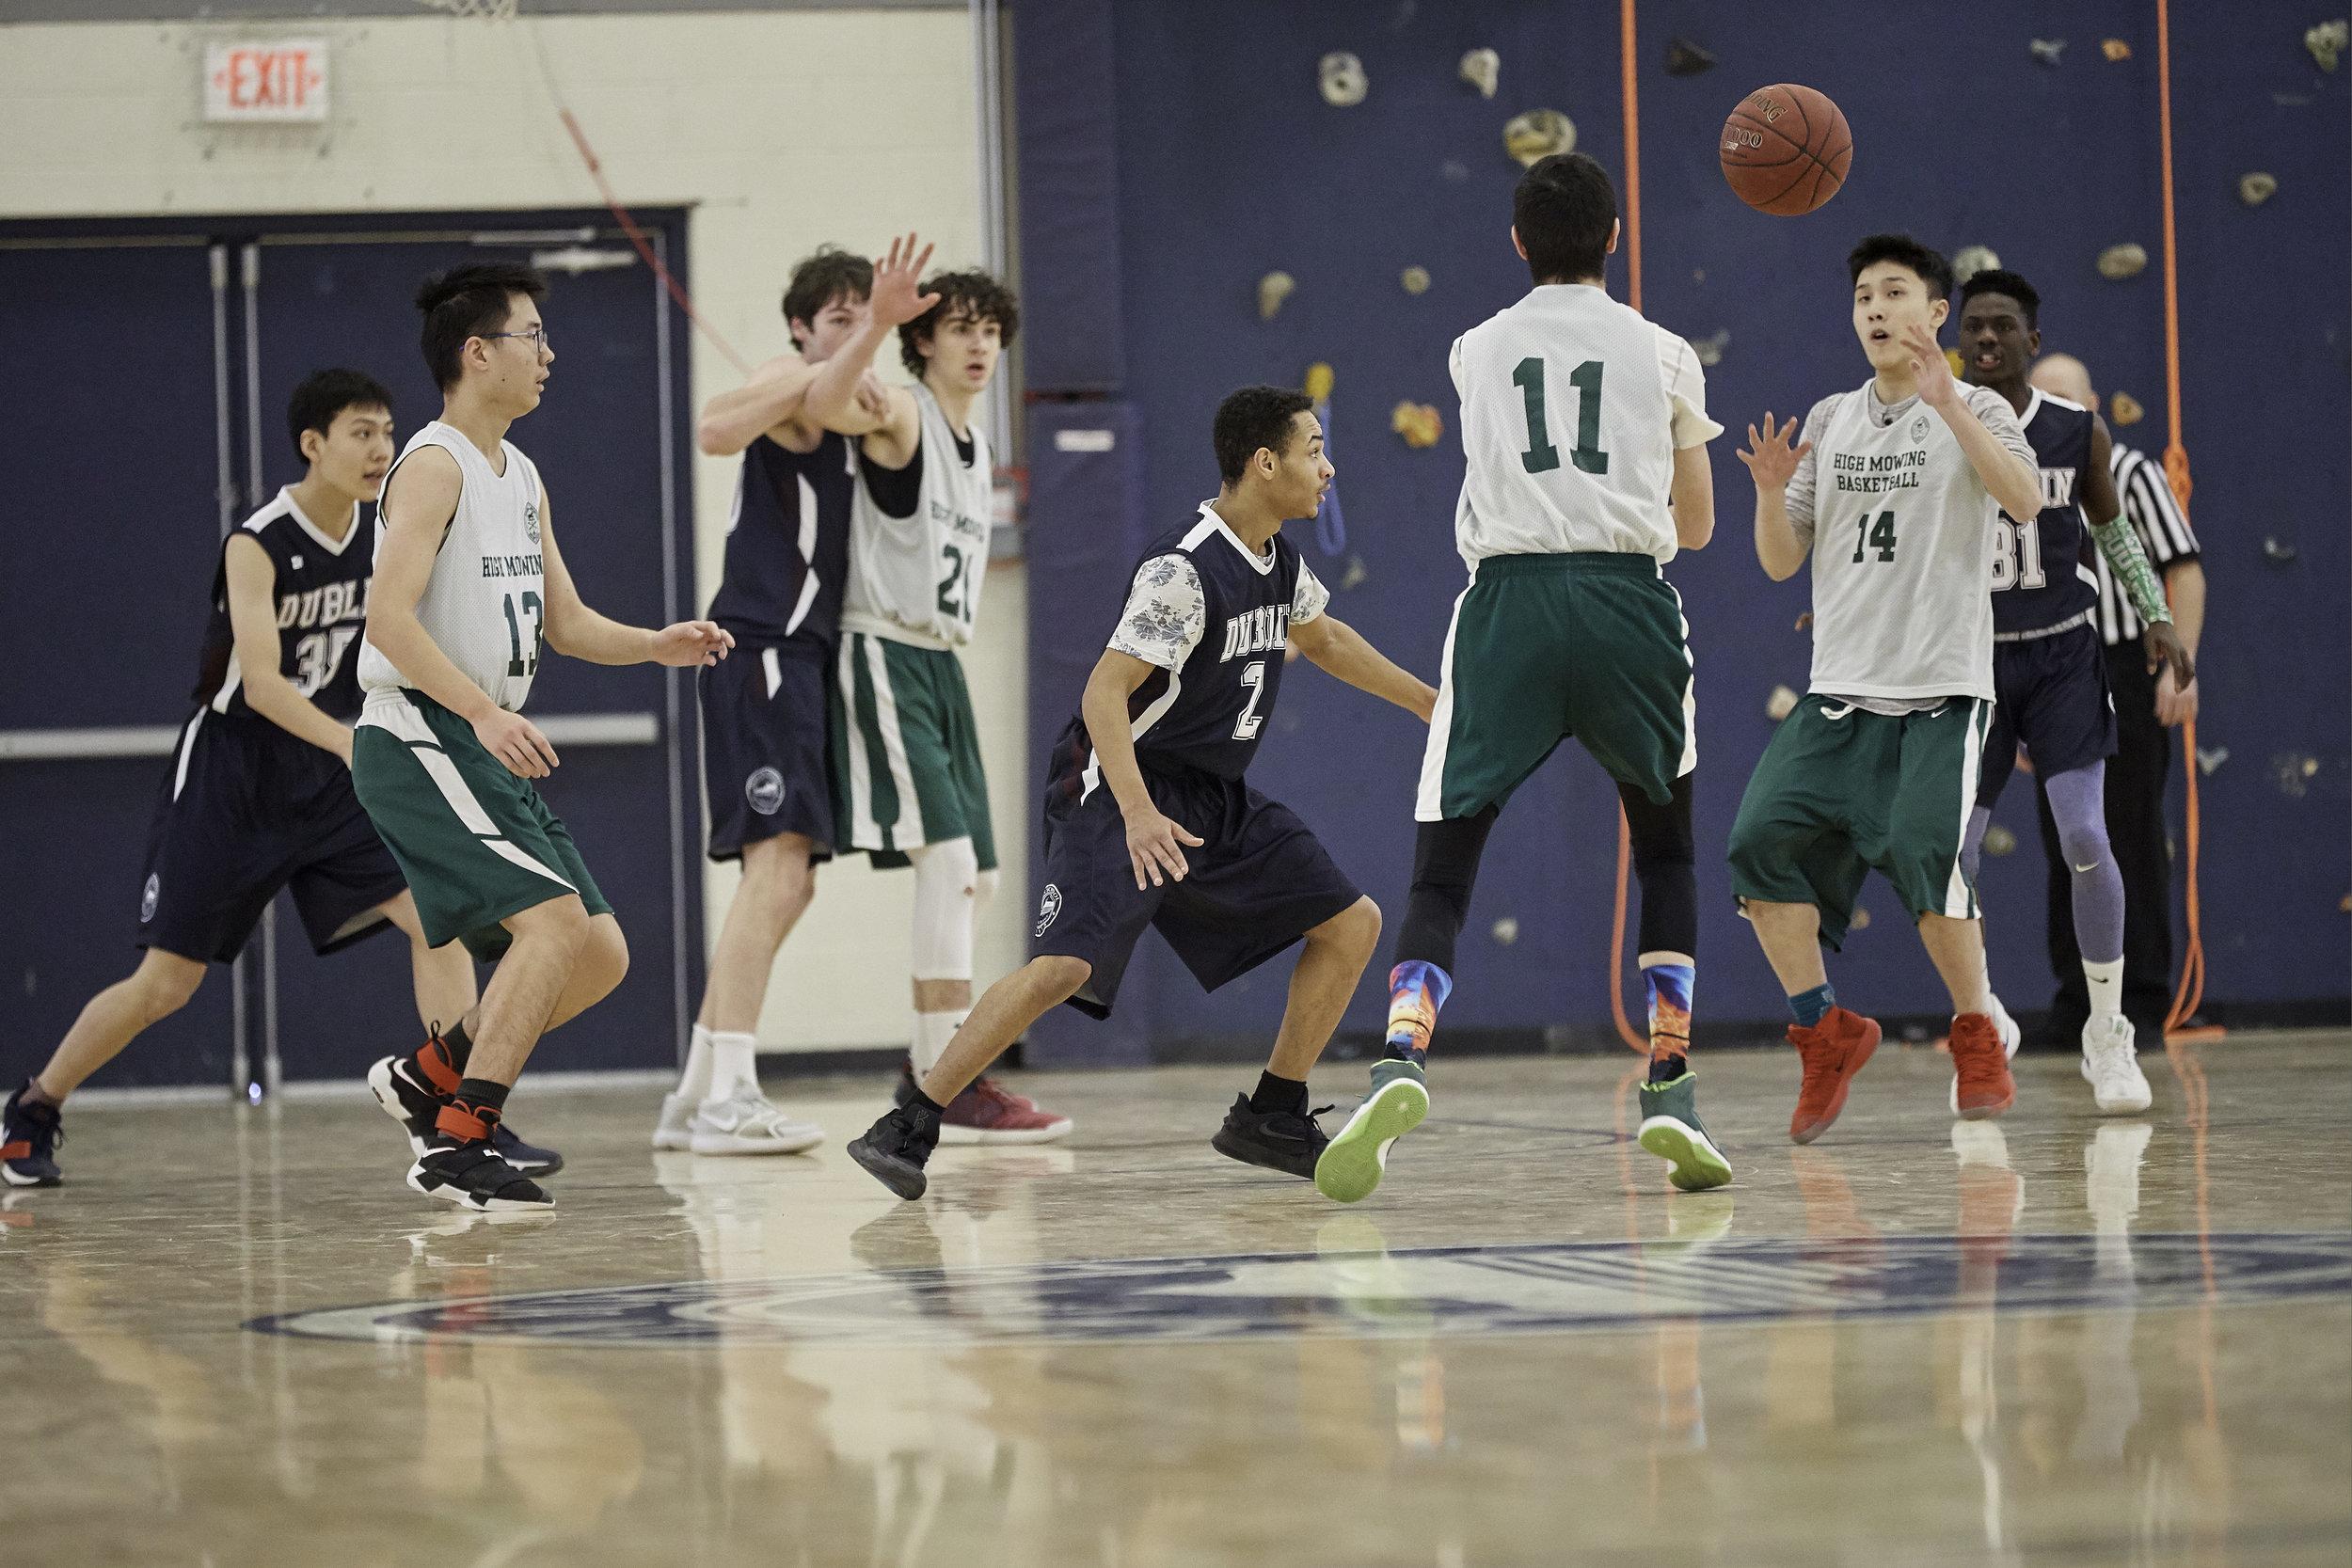 Boys Varsity Basketball vs High Mowing School - Feb 02 2019 - 0023.jpg